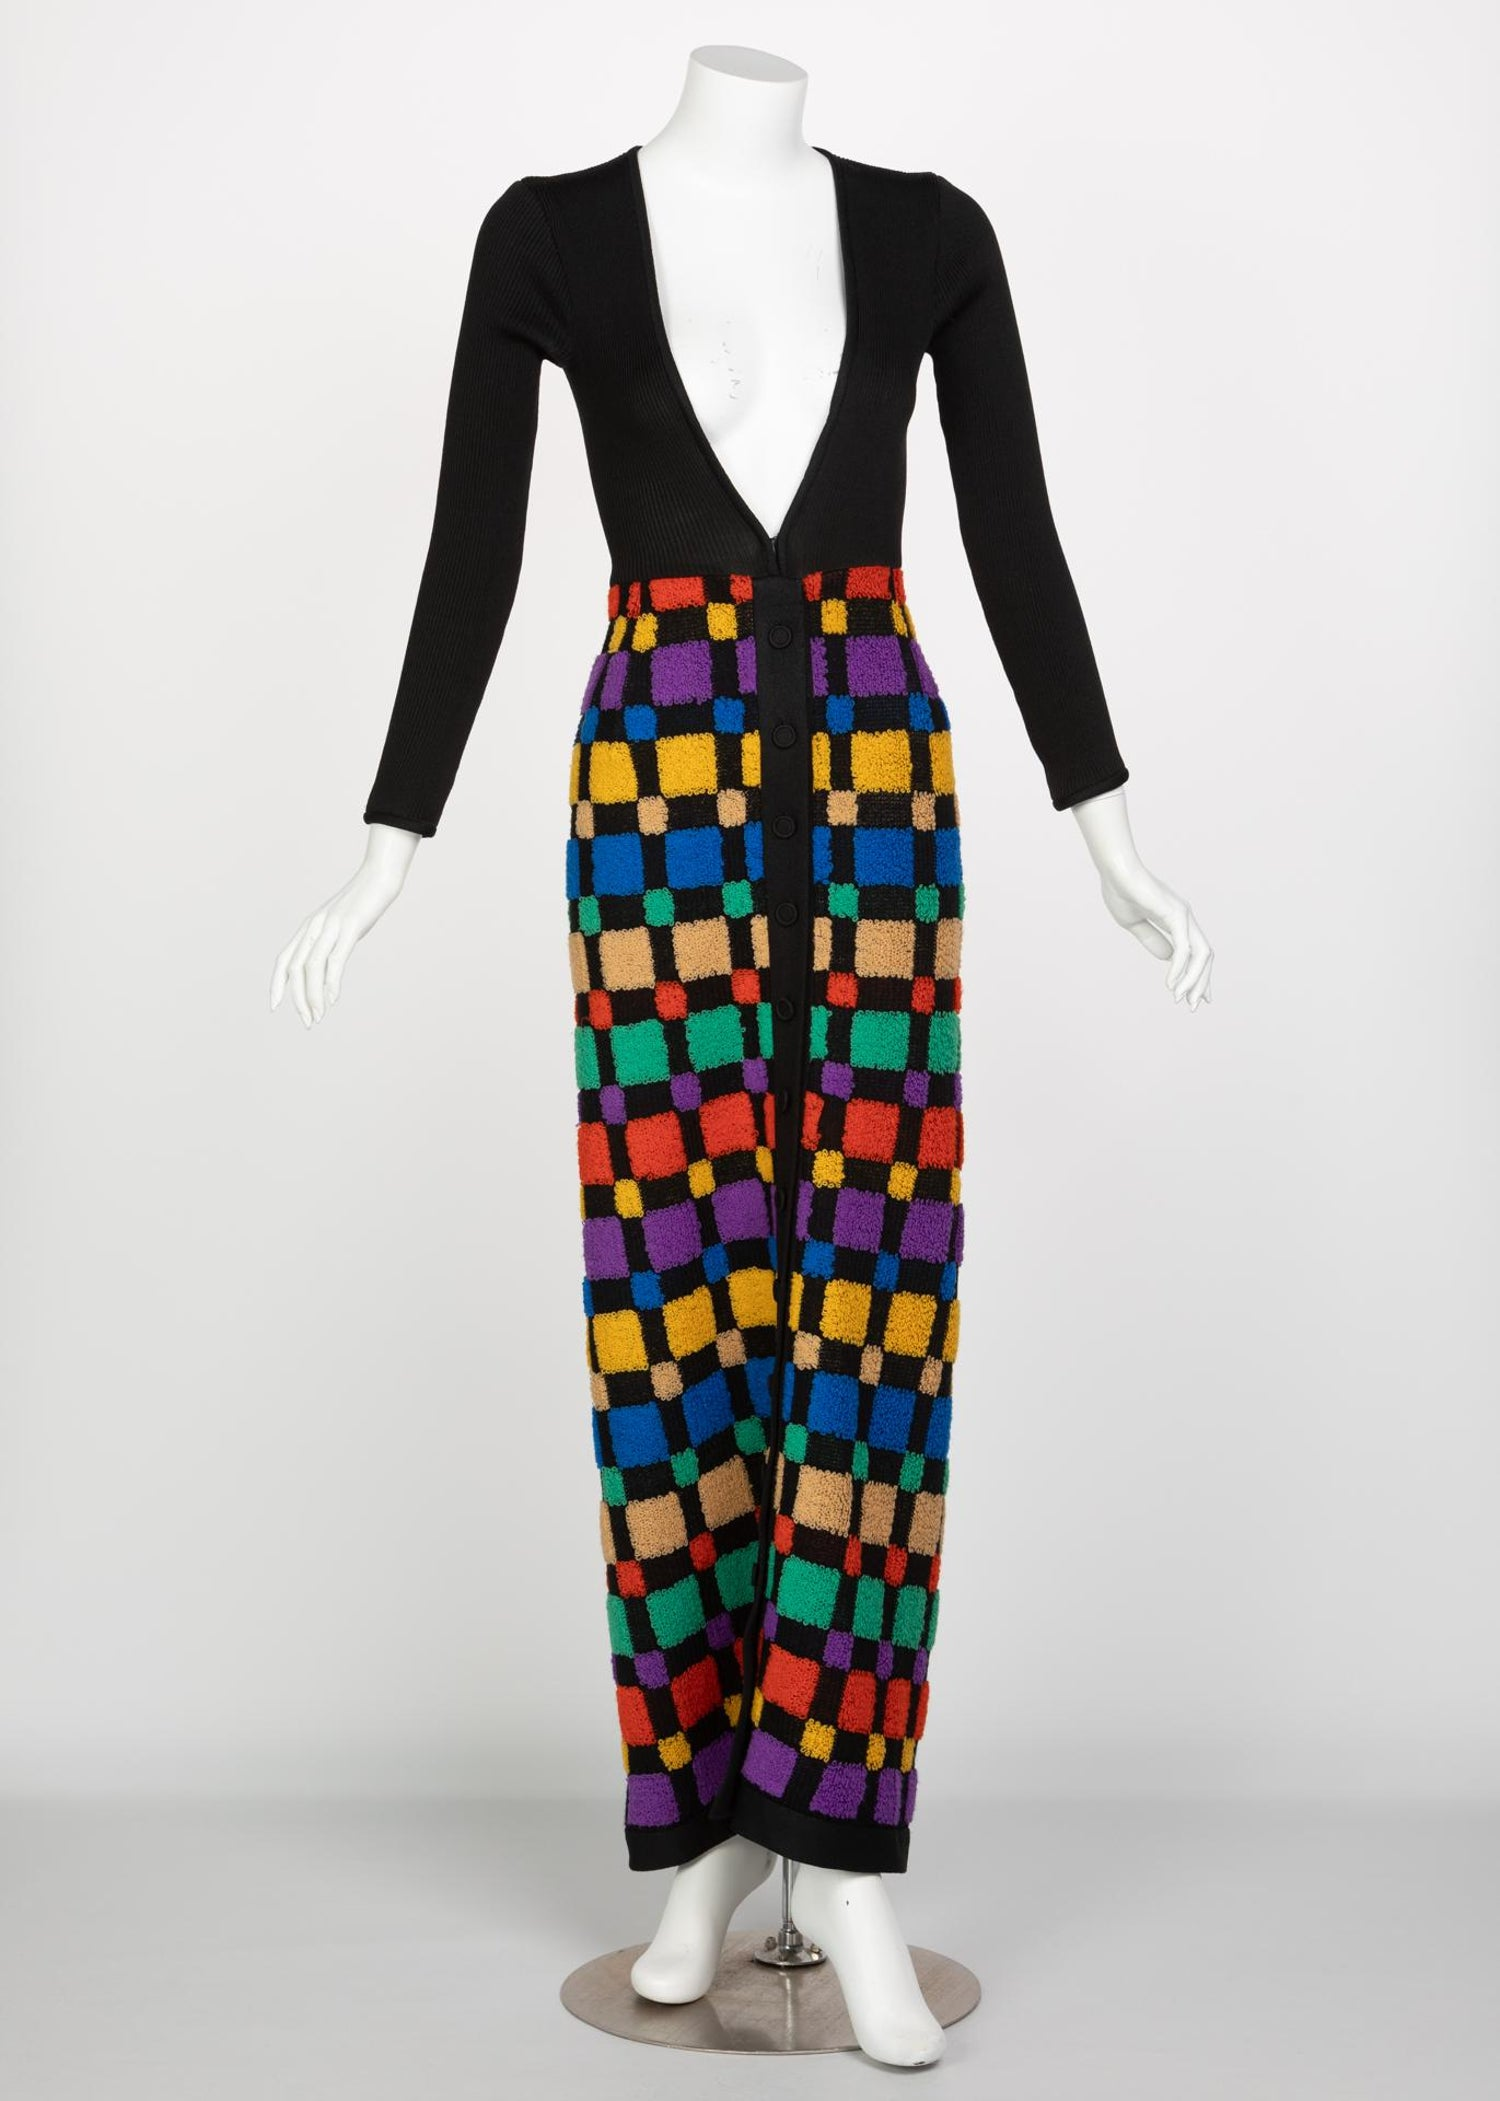 d4128c792068 Vintage Color-Block Maxi Plunge Neck Sweater Dress, 1960s For Sale at  1stdibs